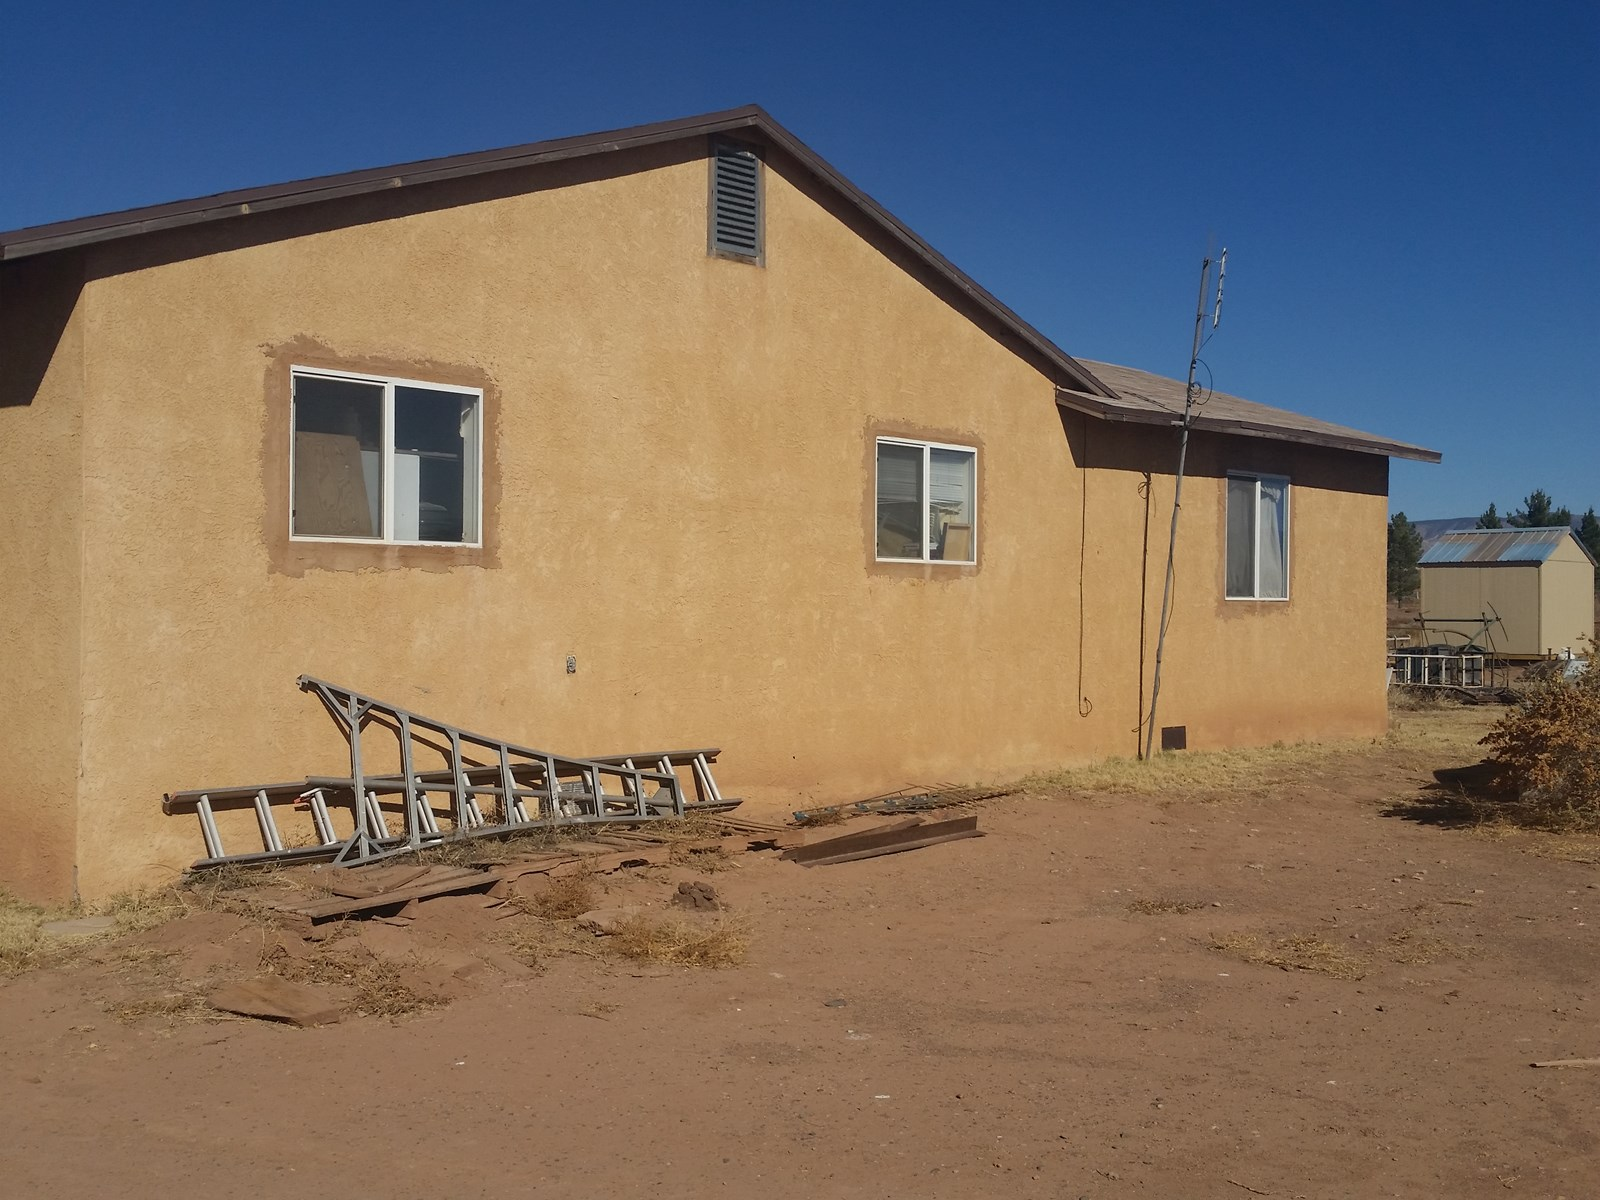 Starter Home in Tularosa, NM